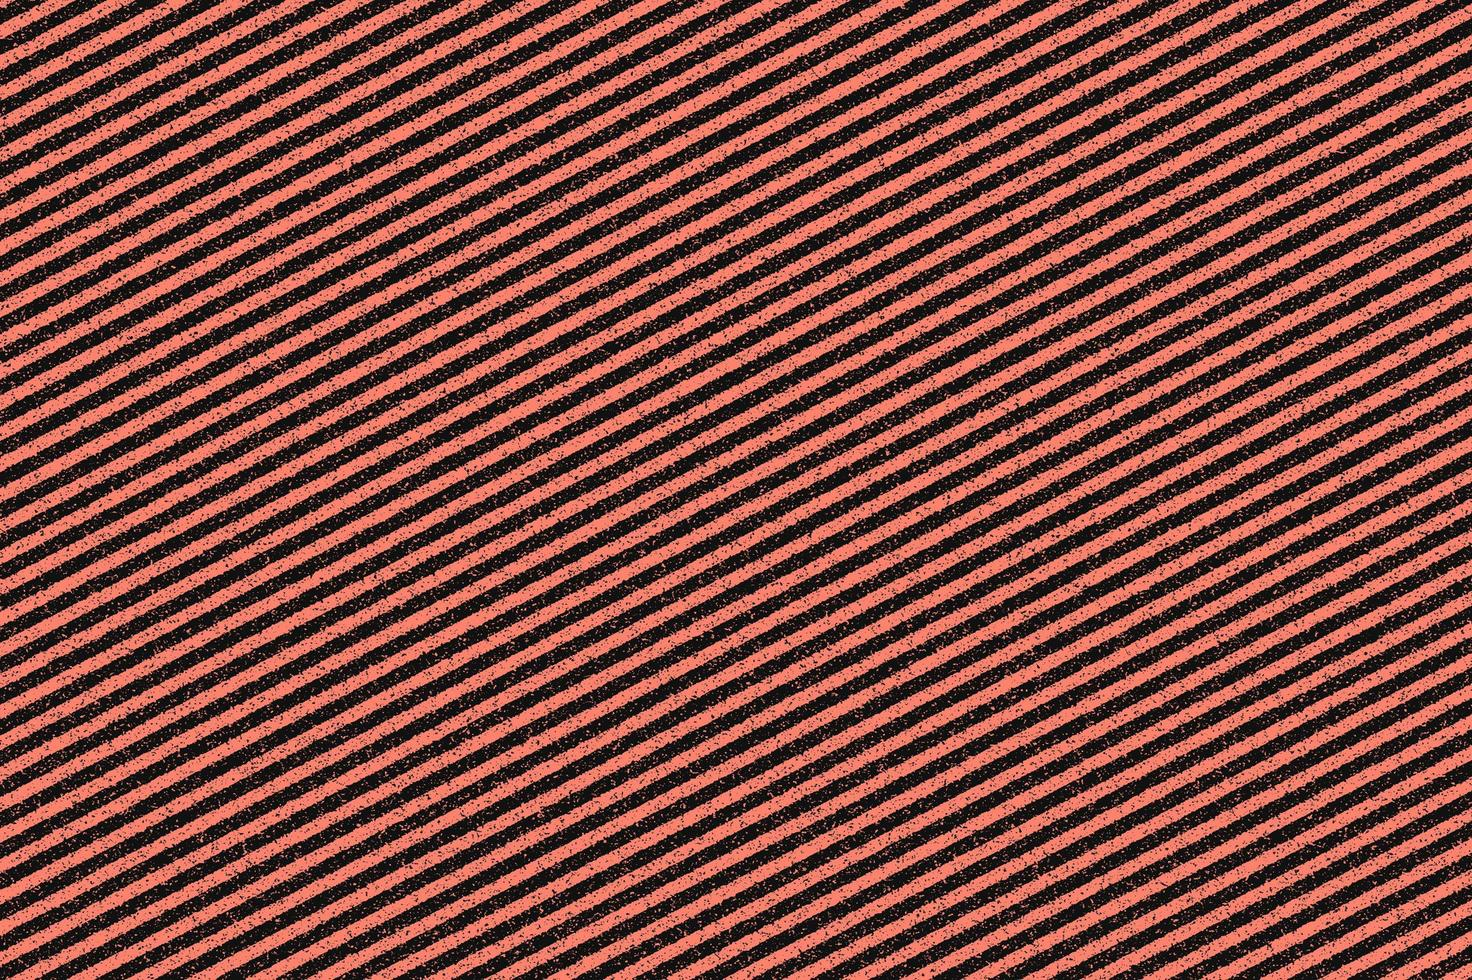 Black and crimson diagonal stripes photo